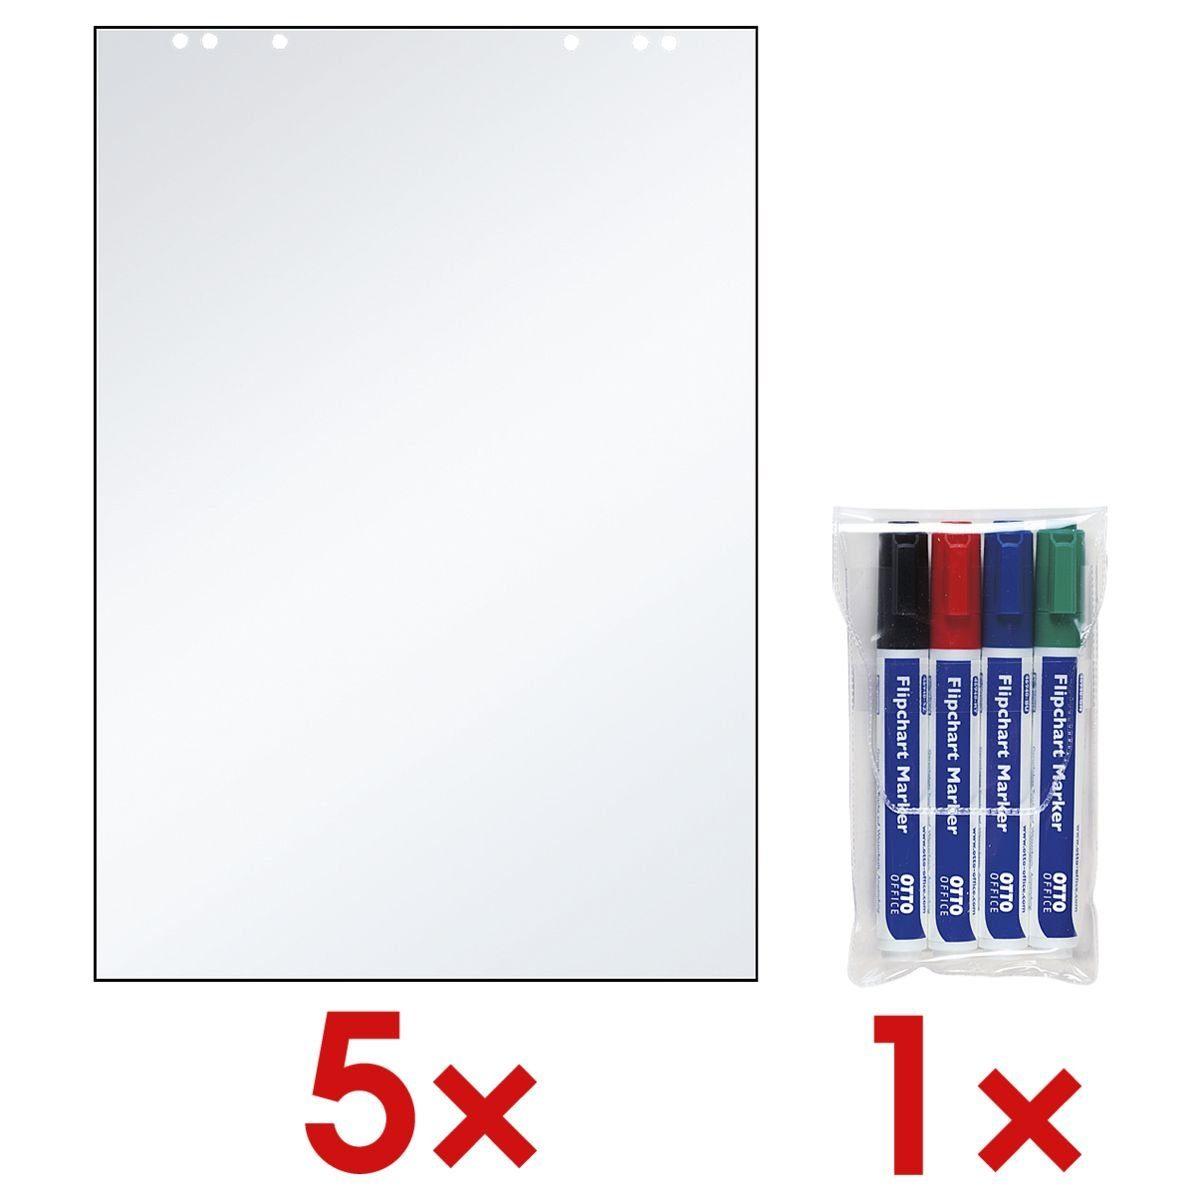 OTTOOFFICE STANDARD 5 Flipchartblöcke inkl. 4er-Pack Flipchart Marker 1 Set